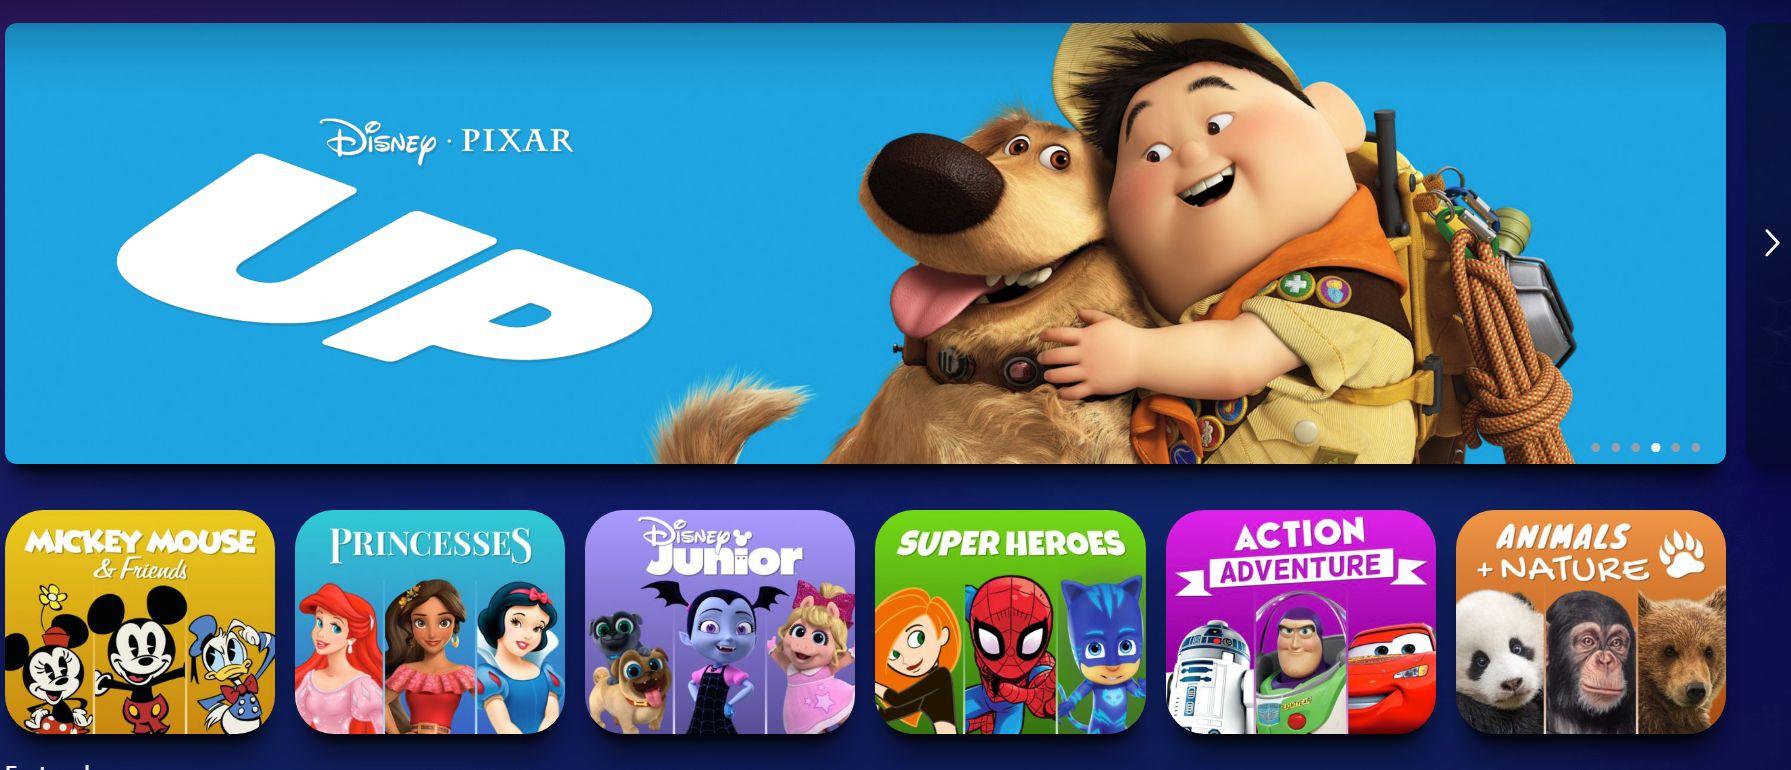 disney plush kids profile interface